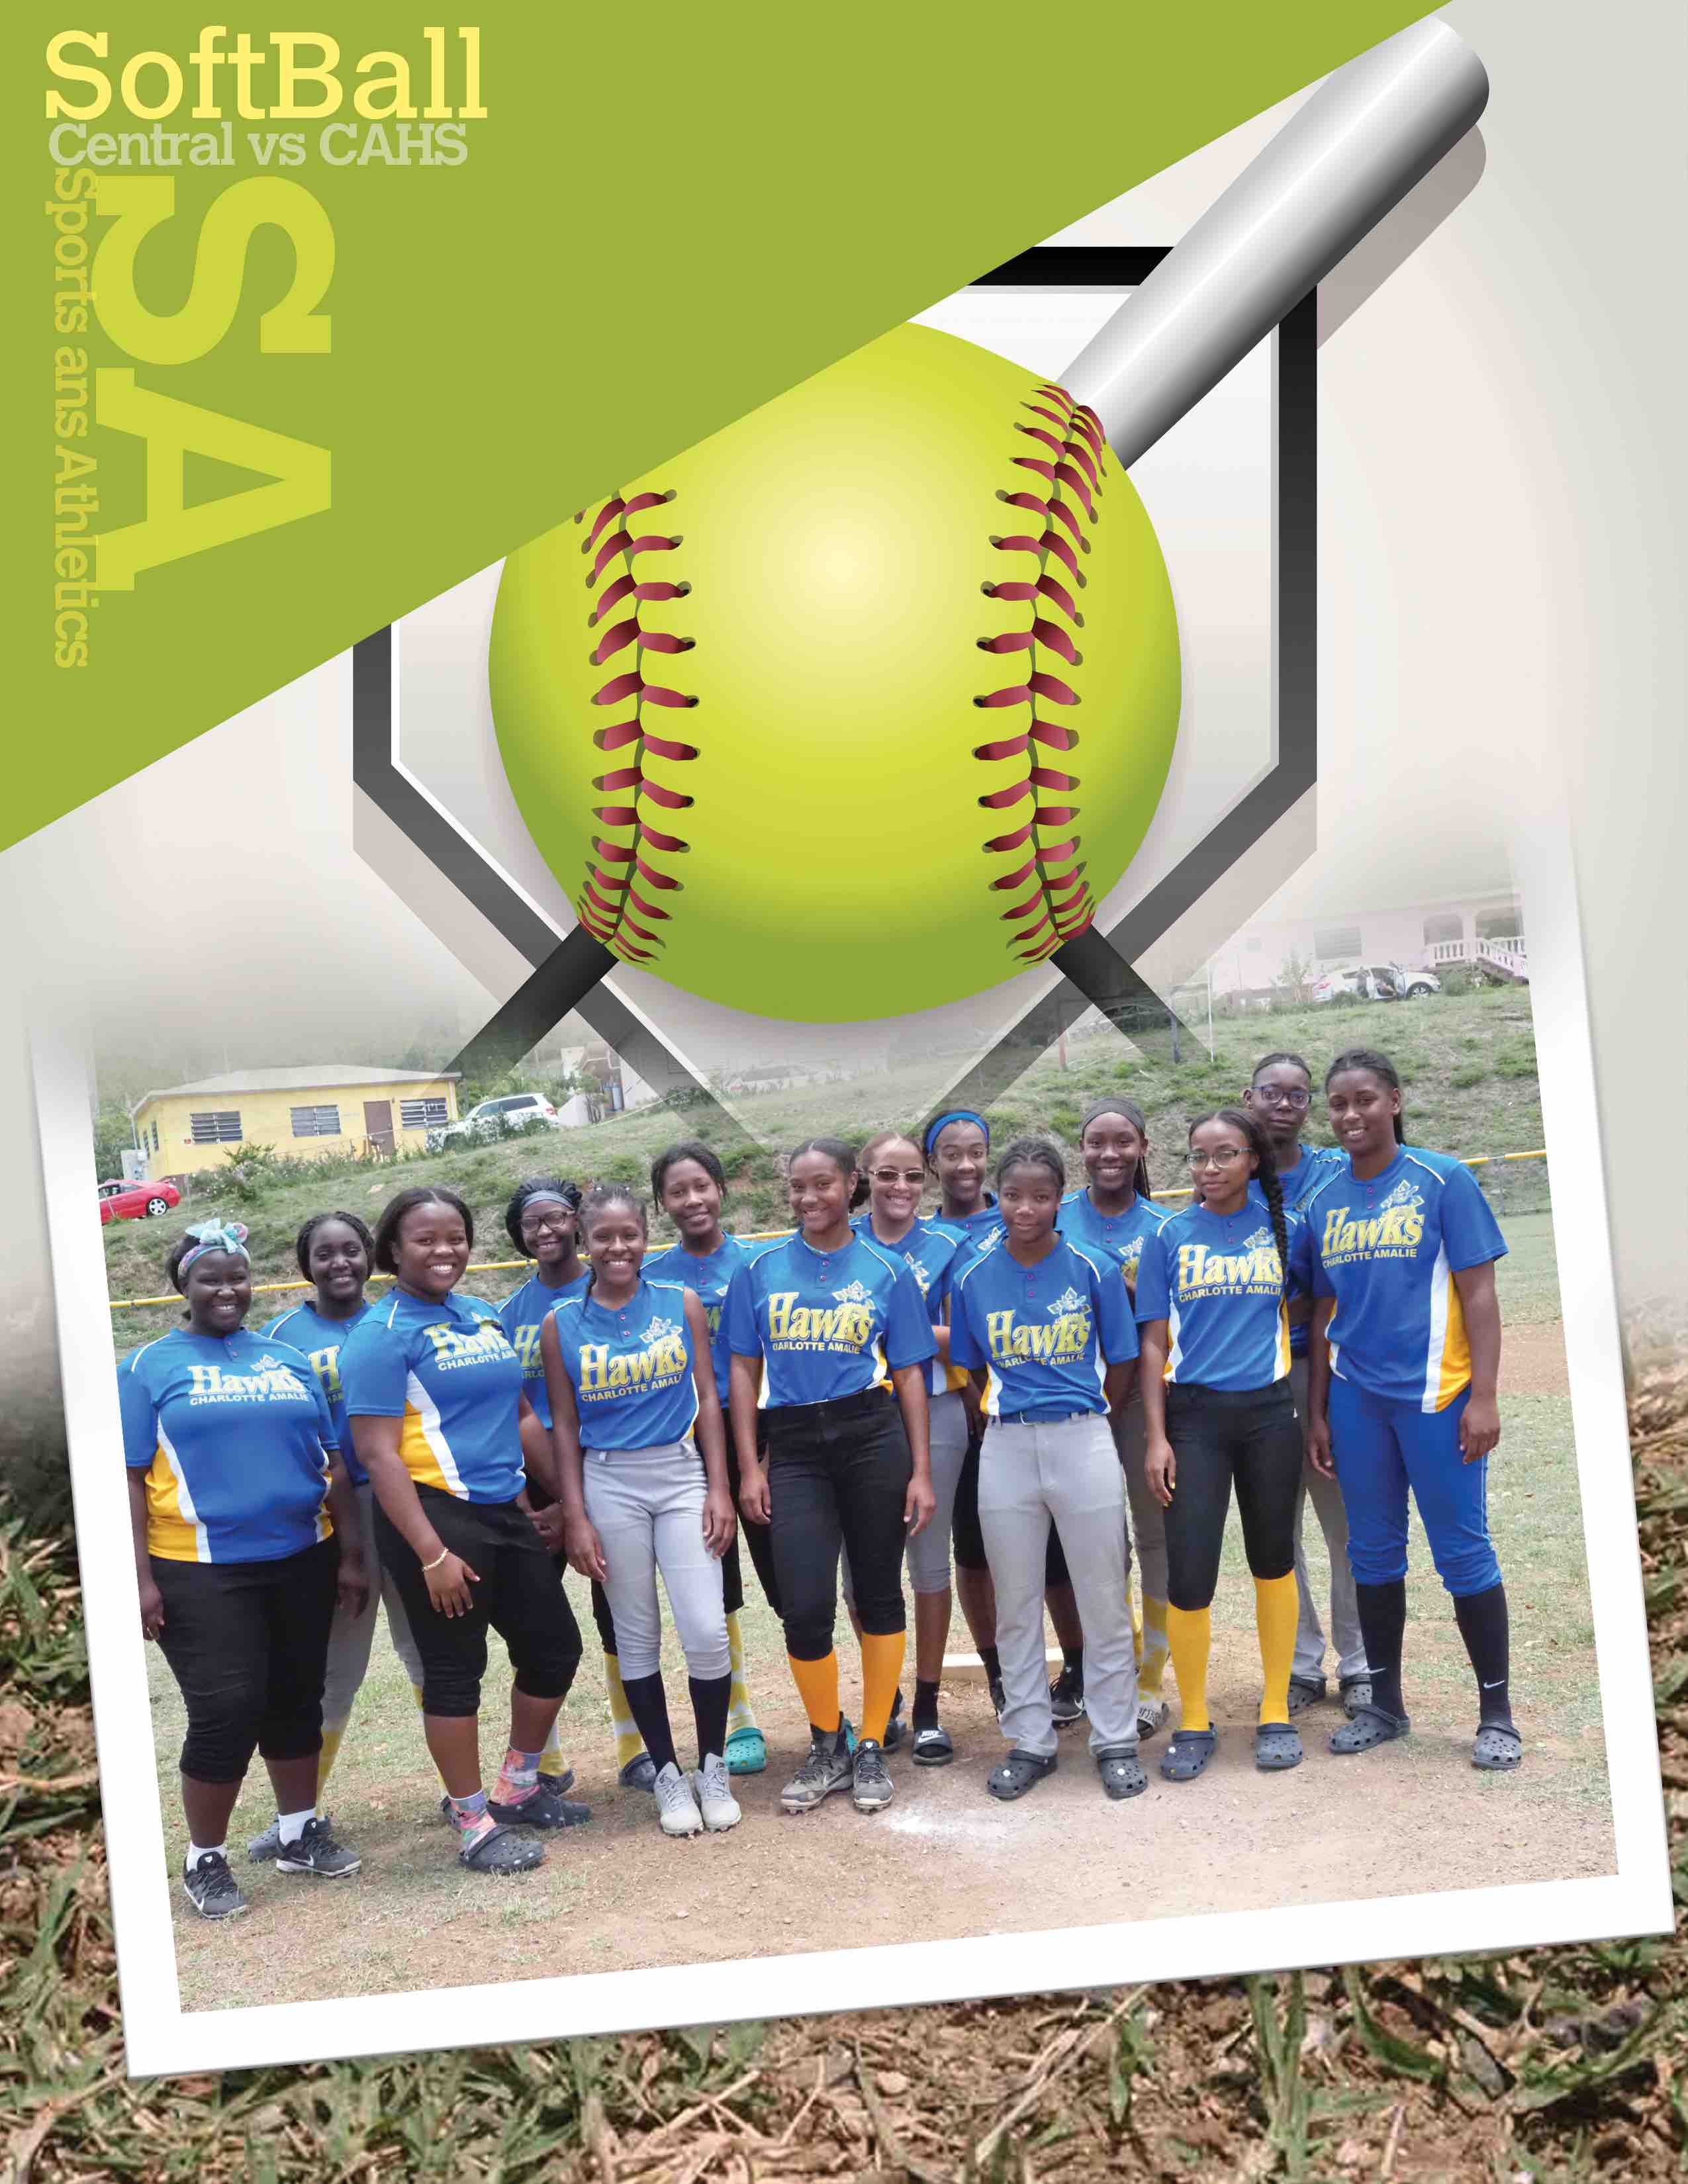 CAHS Girls Softball Team Wins Tournament